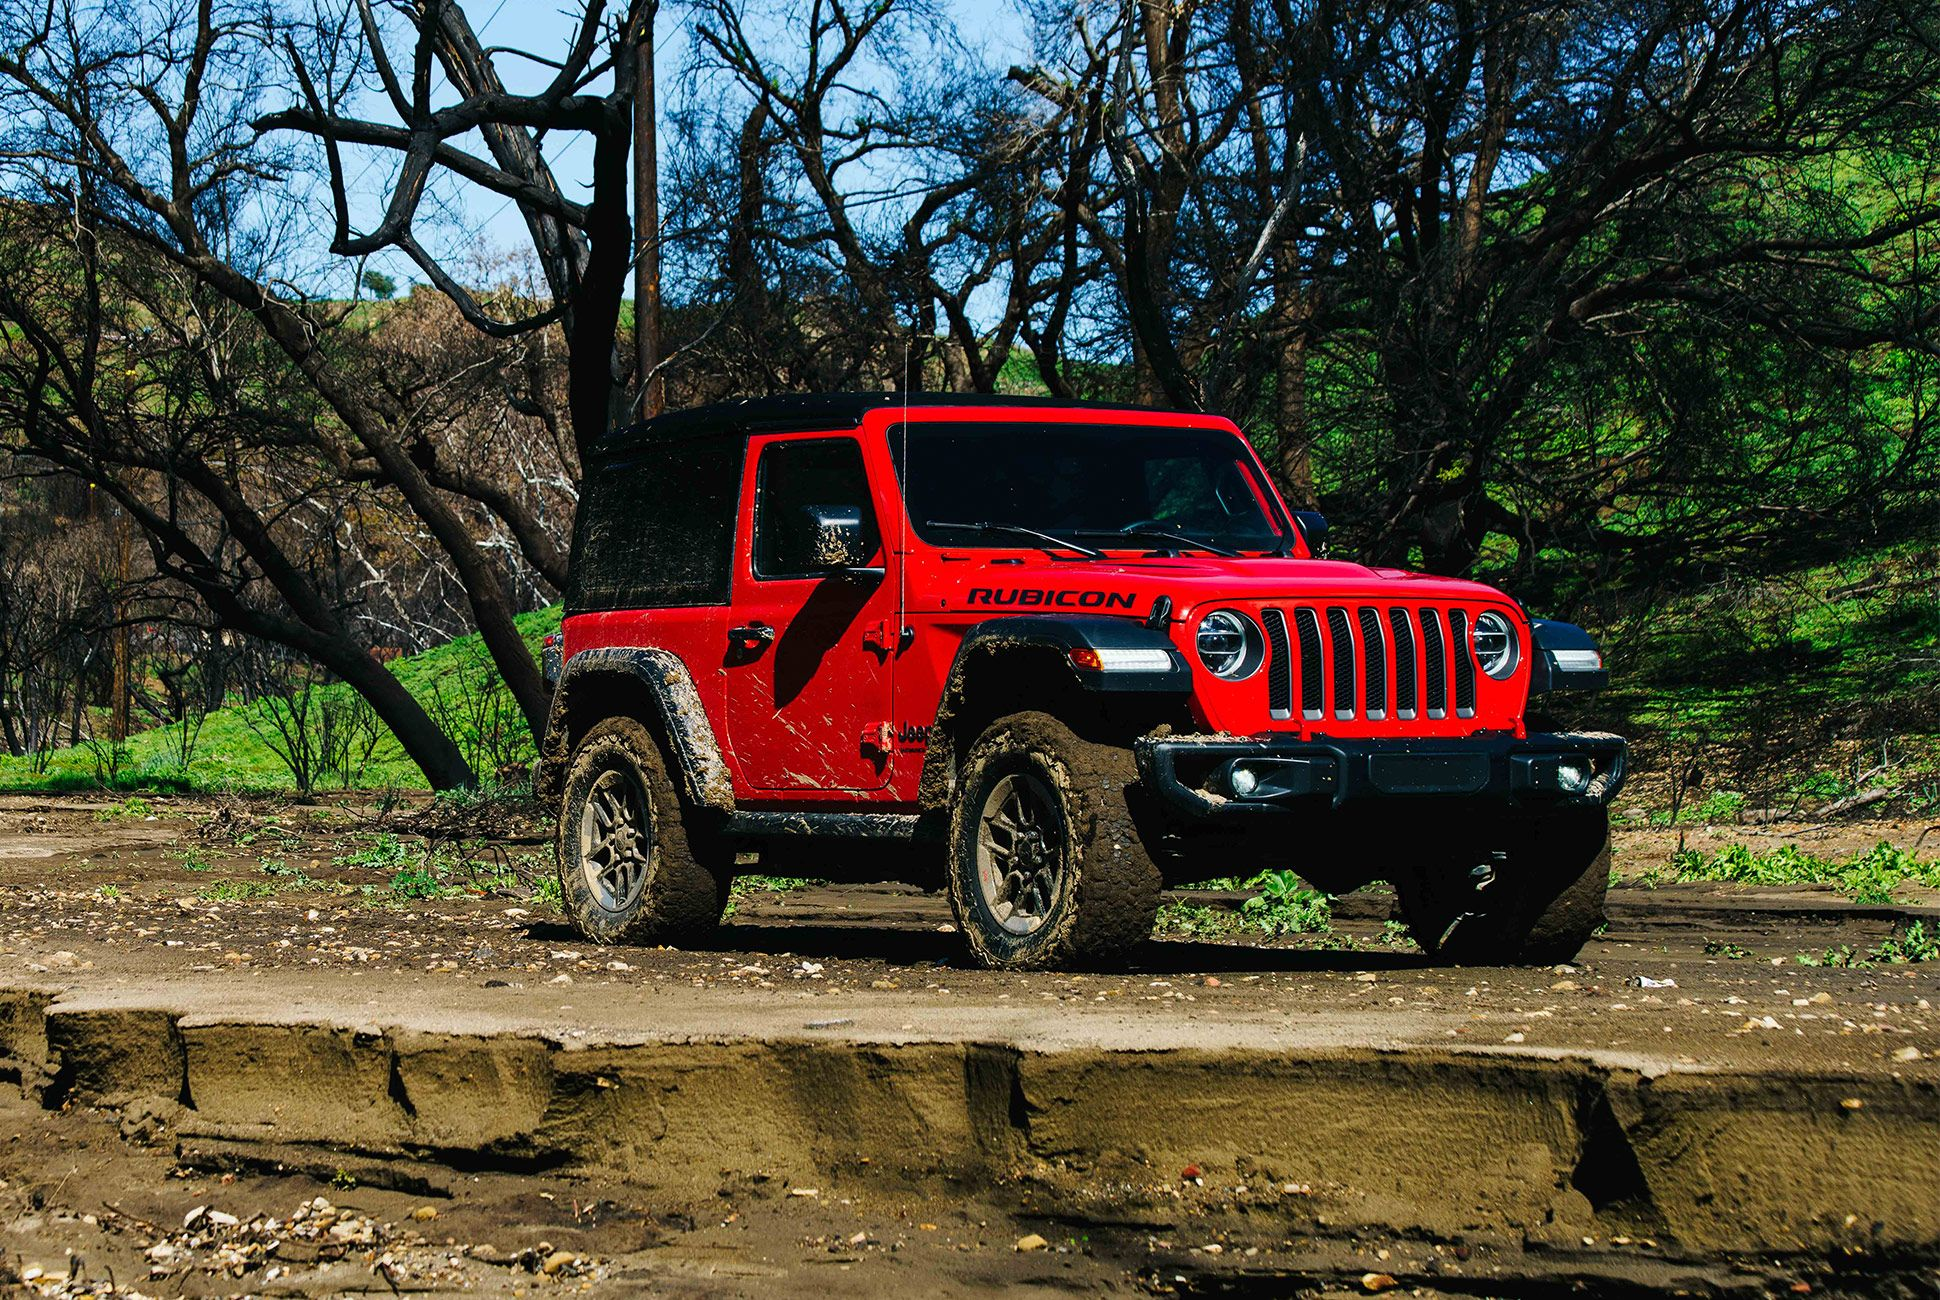 Jeep-Wrangler-2-0-Turbo-gear-patrol-slide-1